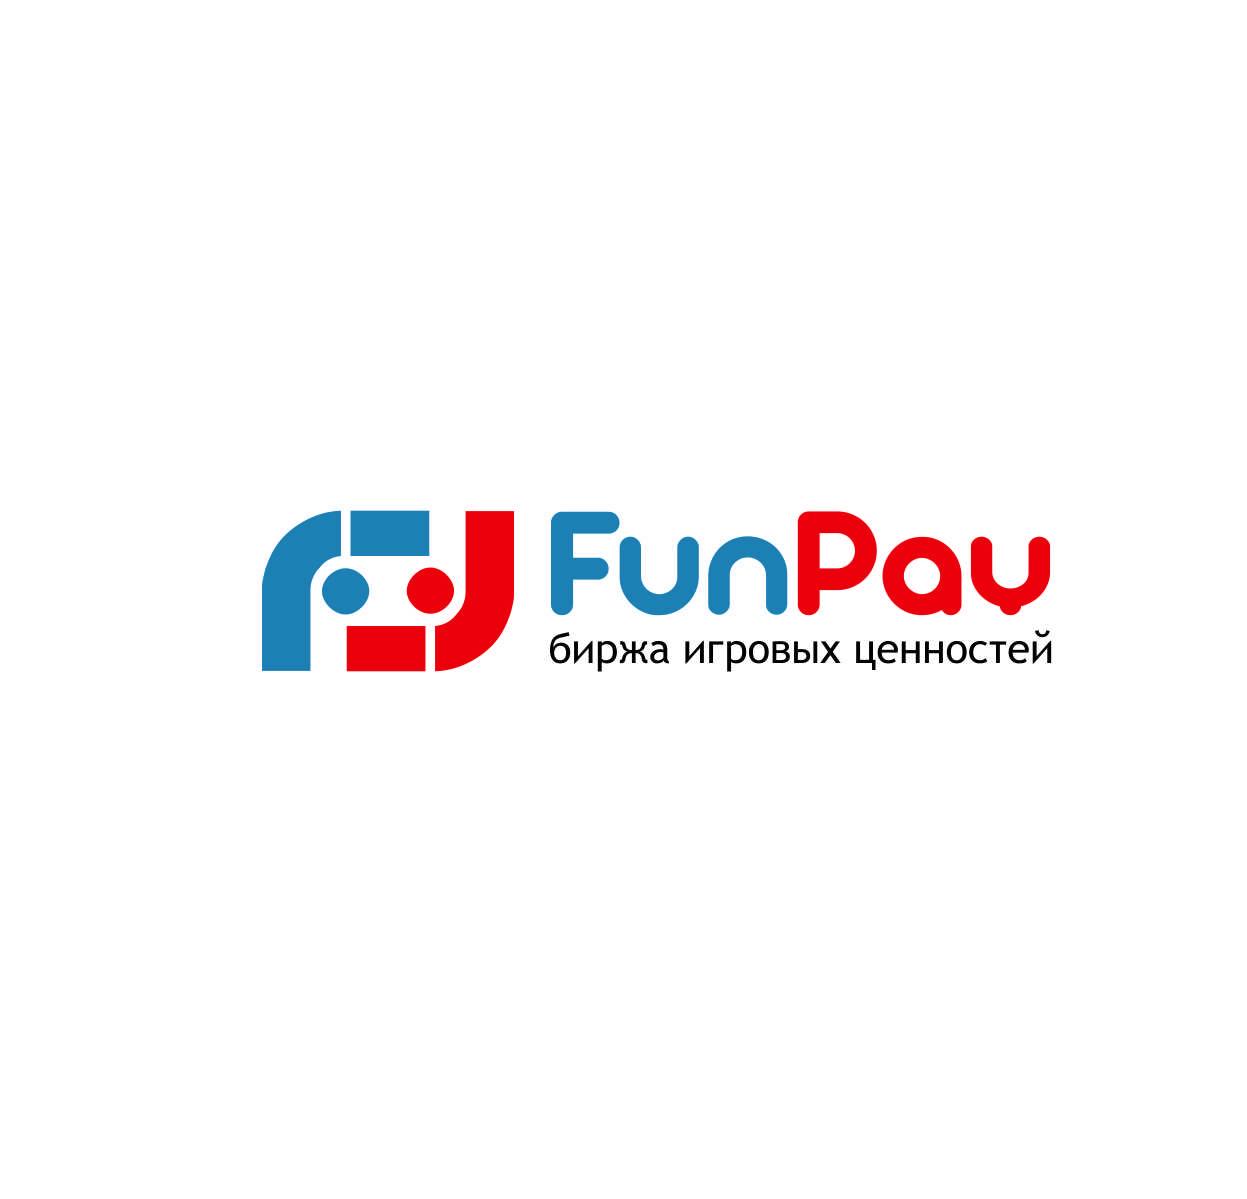 Логотип для FunPay.ru фото f_3265990f30643fde.jpg